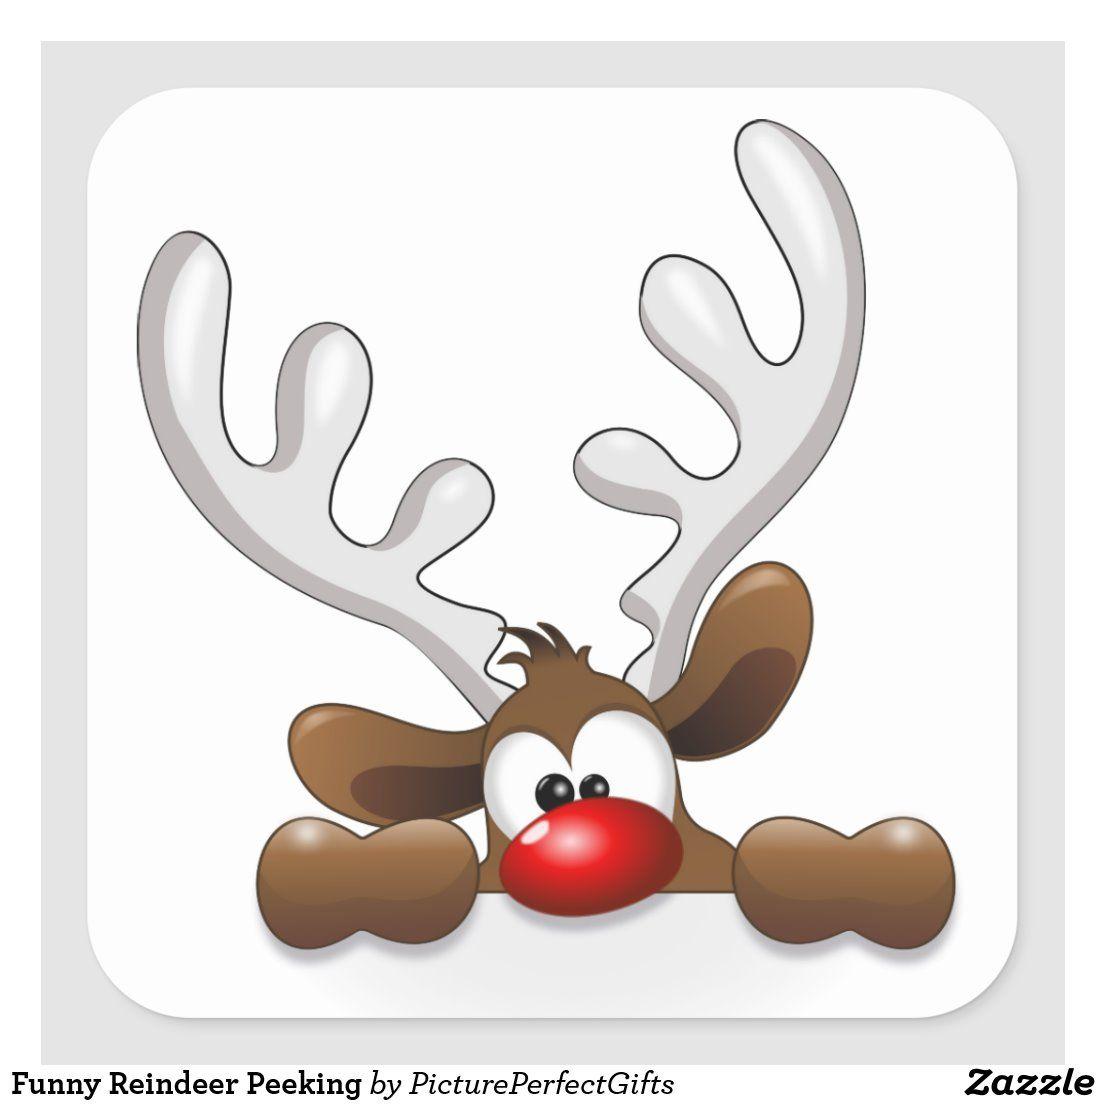 Funny Reindeer Peeking Square Sticker Zazzle Com In 2020 Christmas Clipart Christmas Art Christmas Images